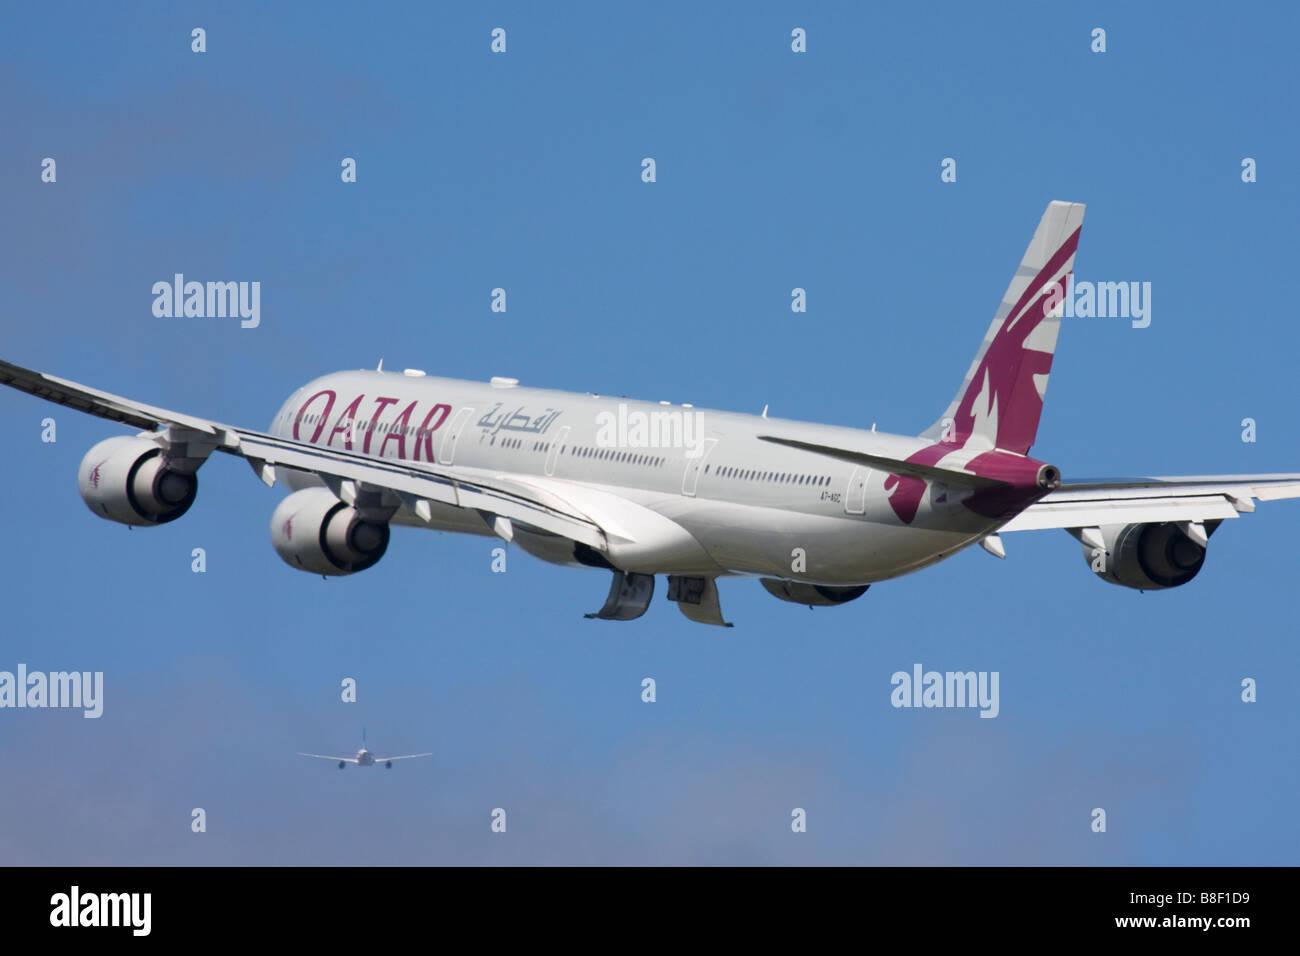 Qatar Airways Airbus A340-642 departure at London Heathrow Airport, United Kingdom Stock Photo